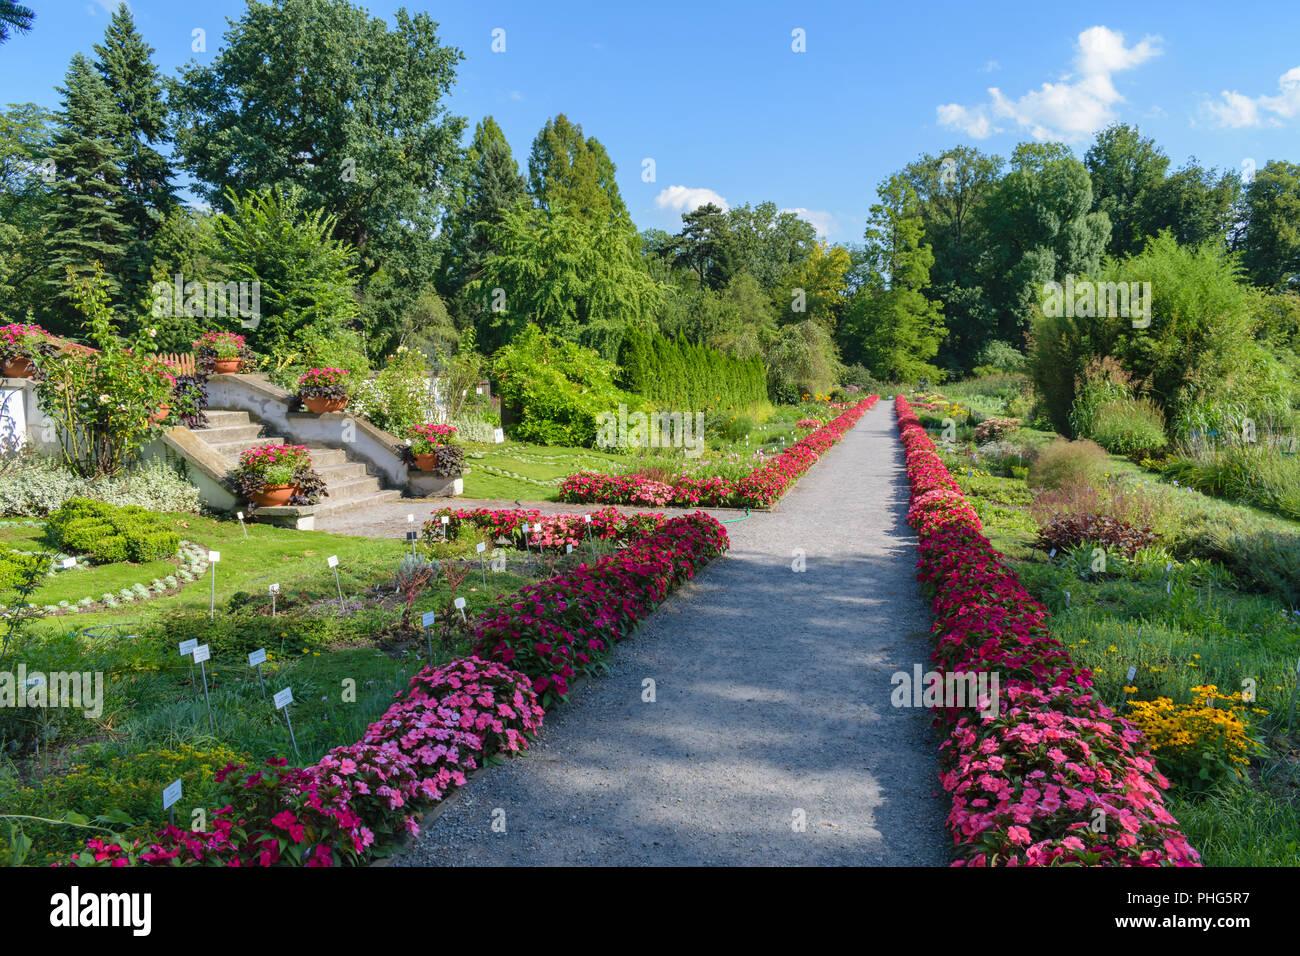 Krakow Poland August 13 2018 Botanic Garden Of The Jagiellonian University Stock Photo Alamy